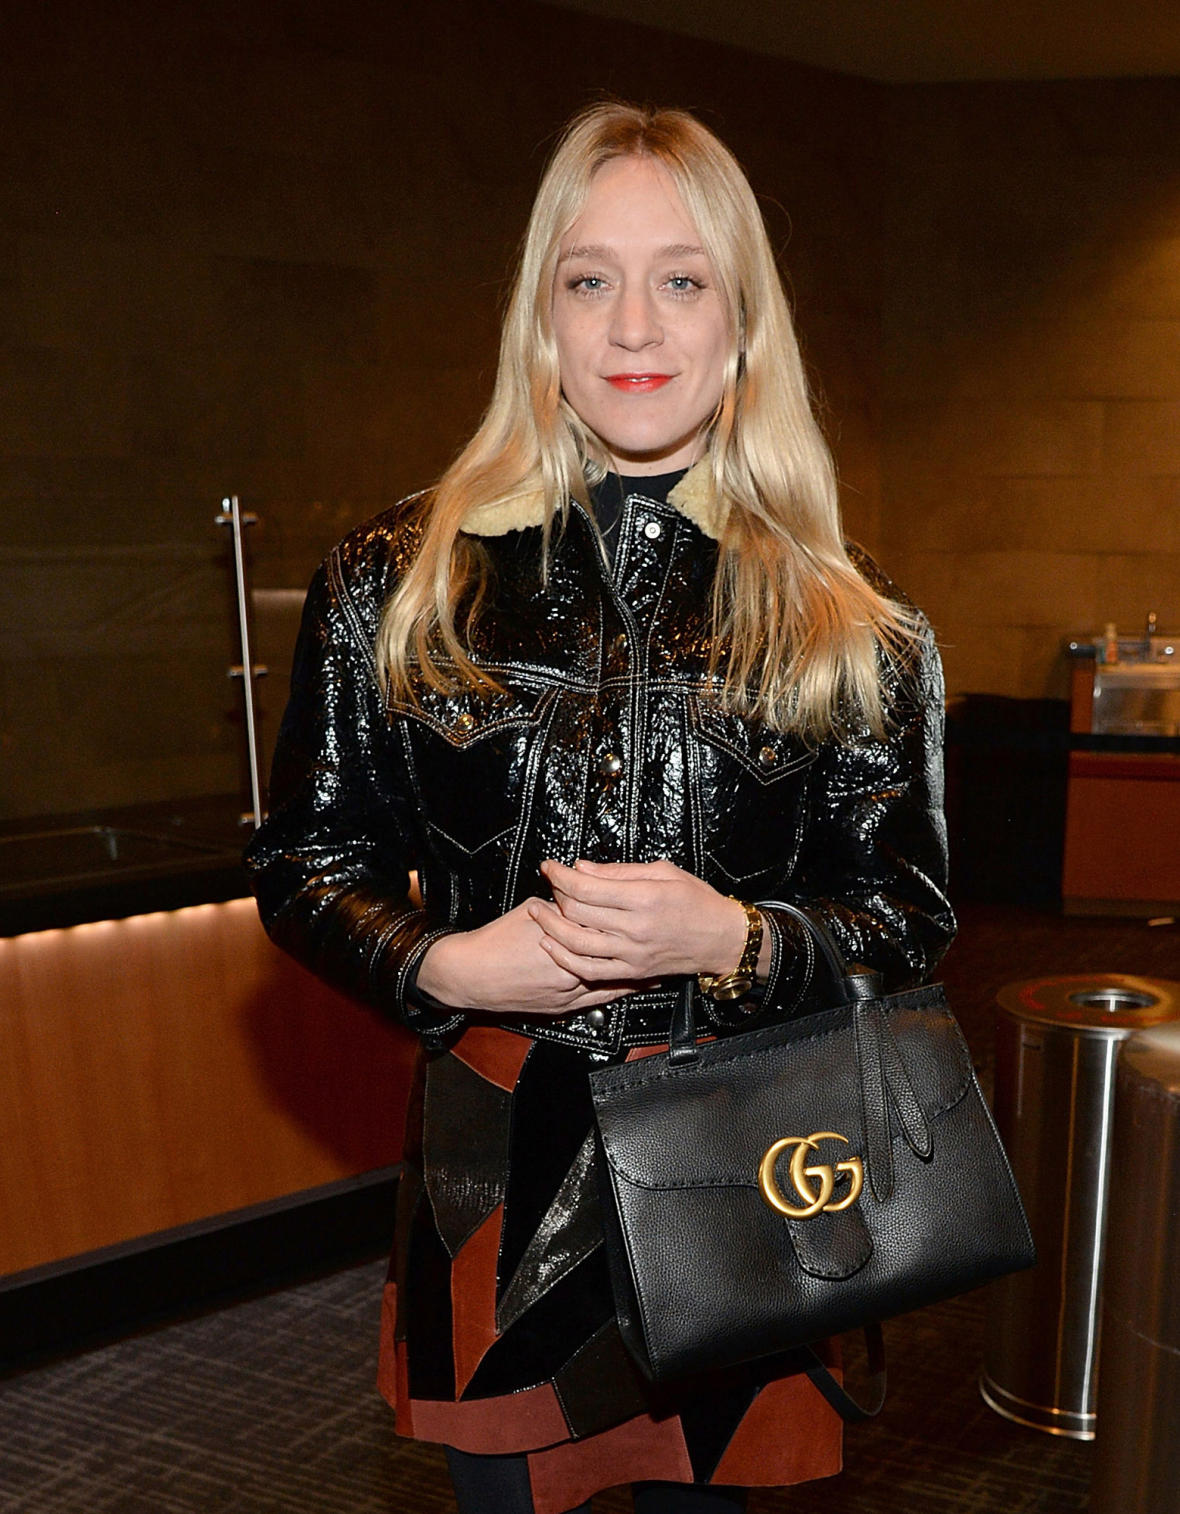 gucci bags celebrity. Gucci Bags Celebrity